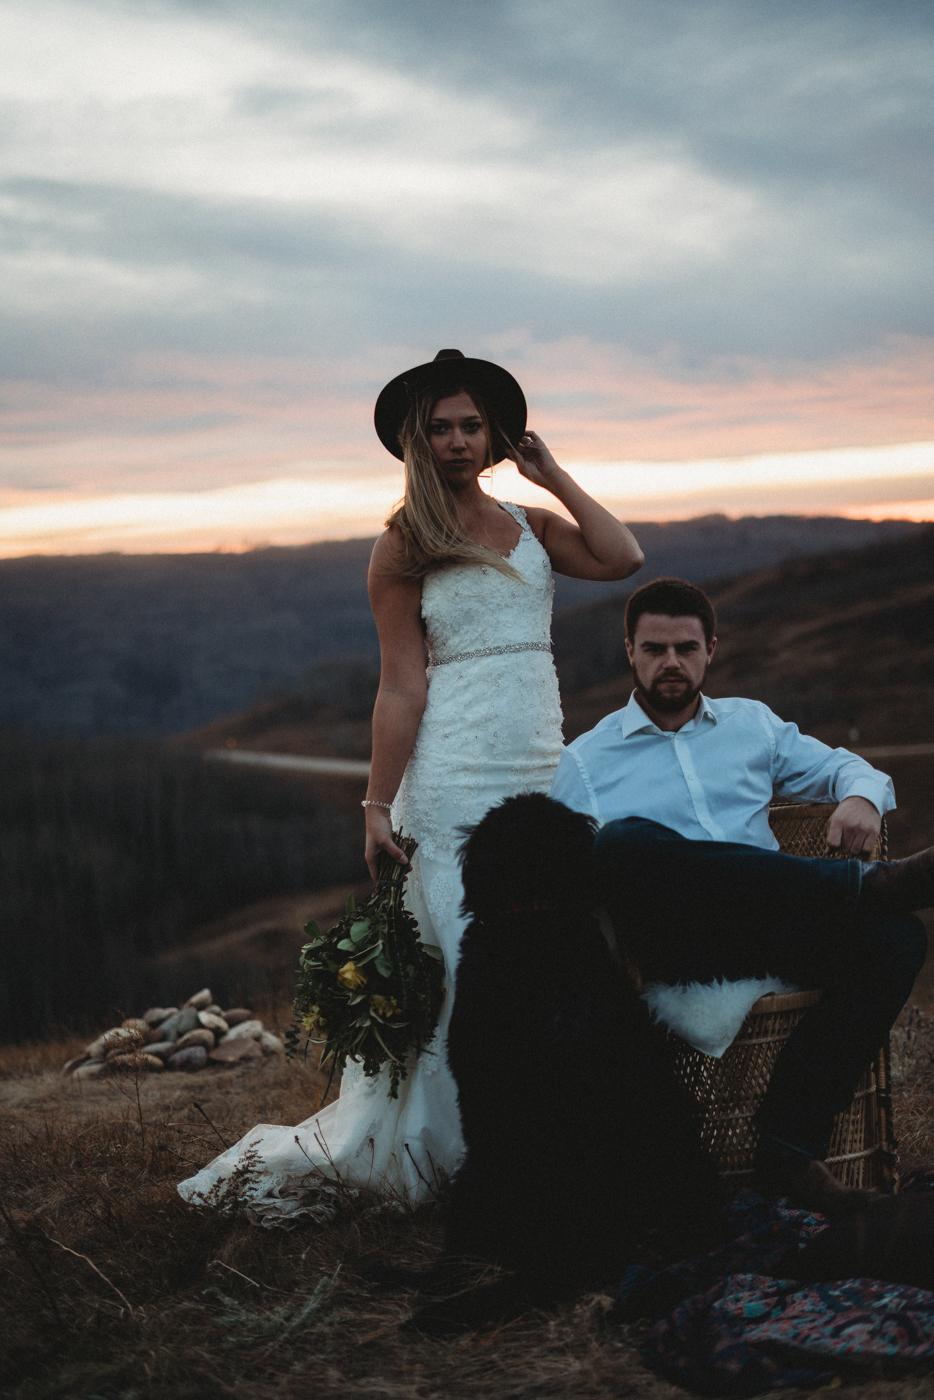 FortSt.John_photographer_TyraEPhotography_Wedding_Couple_Family_Photograhy_DawsonCreek_Elopement_Bride_Boduoir_Portraits-14.jpg